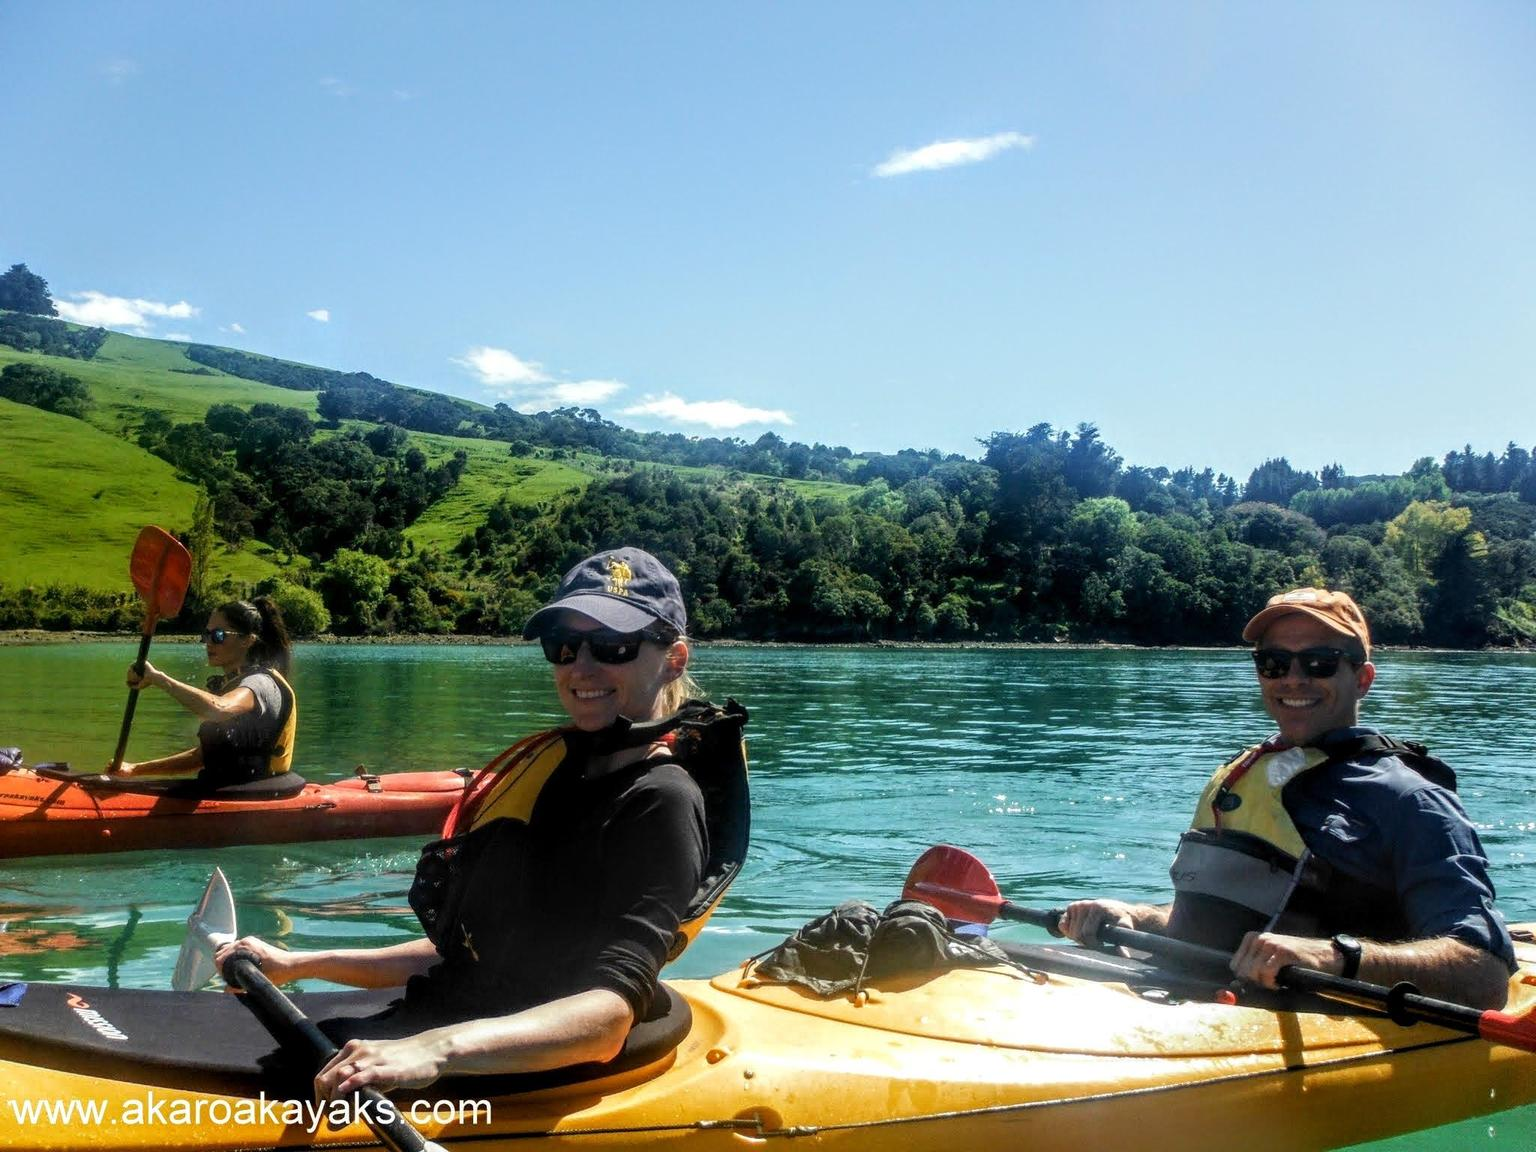 MÁS FOTOS, Shore Excursion: Guided Sea Kayaking through Akaroa Marine Reserve